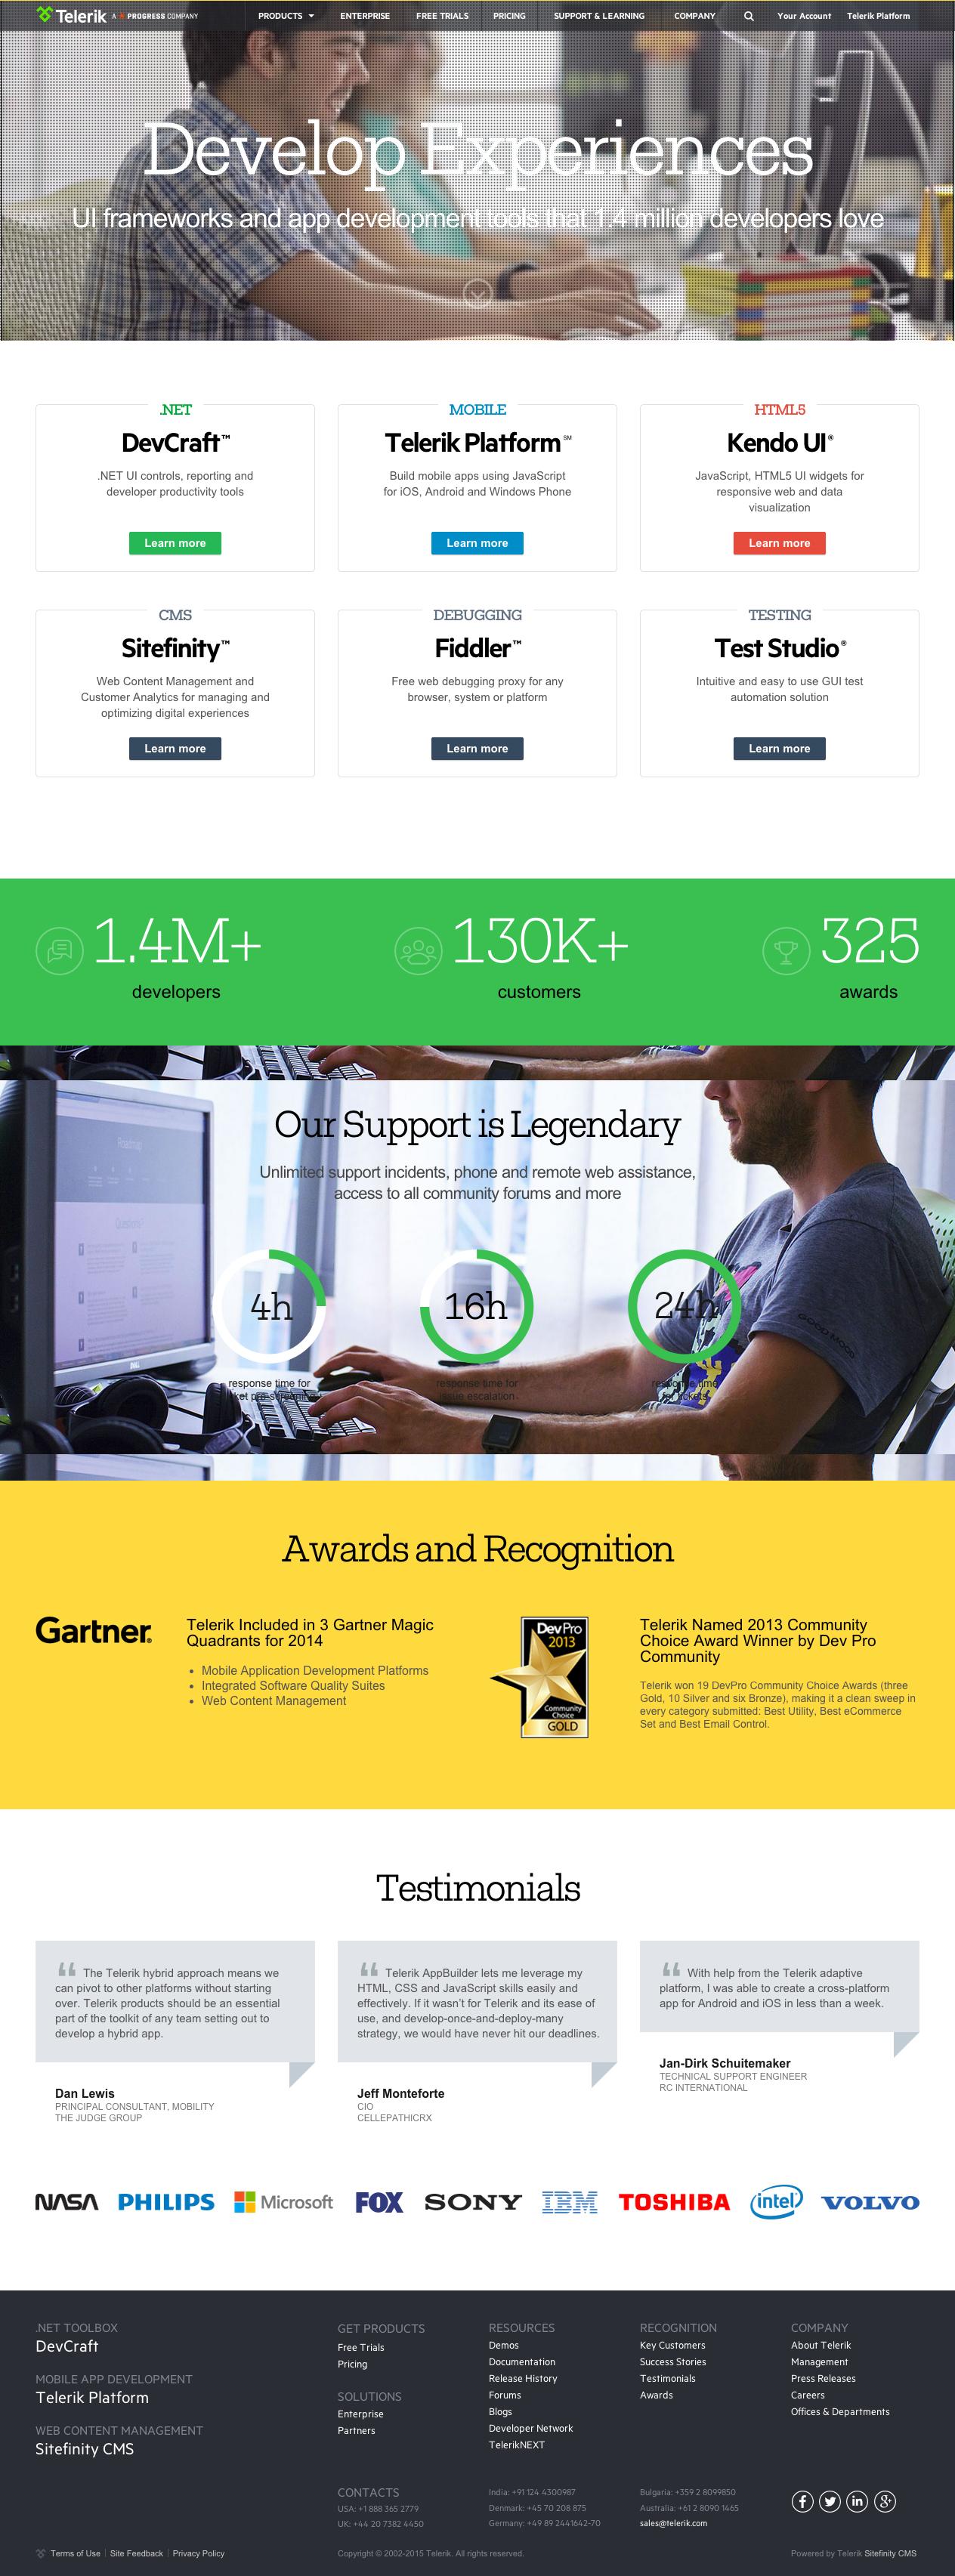 Website Homepage Design 2015 Telerik Full Png 1264 3410 Homepage Design Web Design Web Design Trends